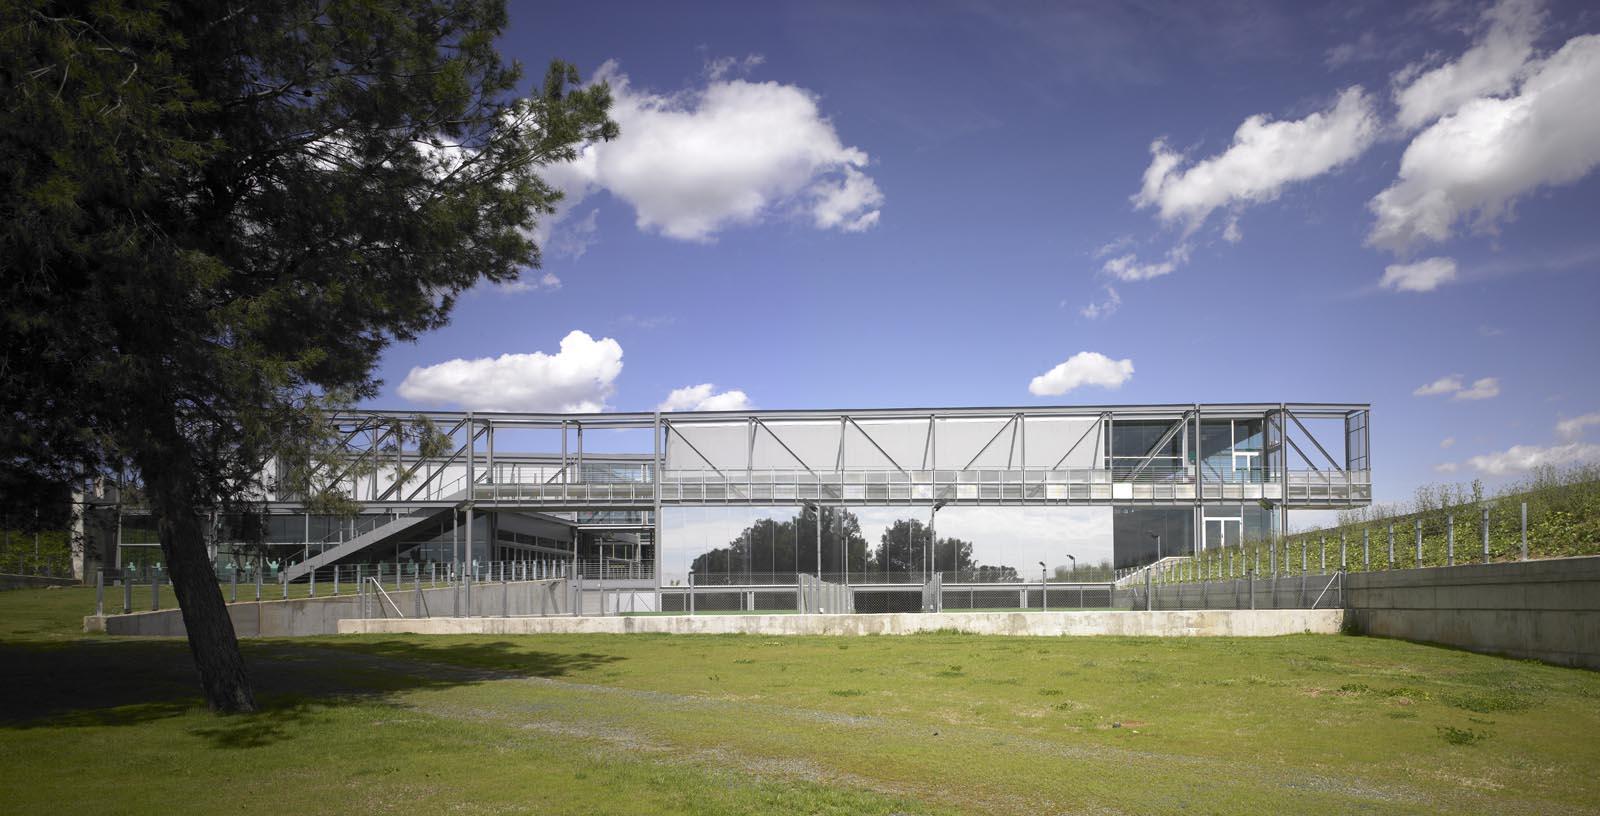 Pau_Gasol_Sports_Center-02-Architecture-IDOM-photo-Eugeni_Pons